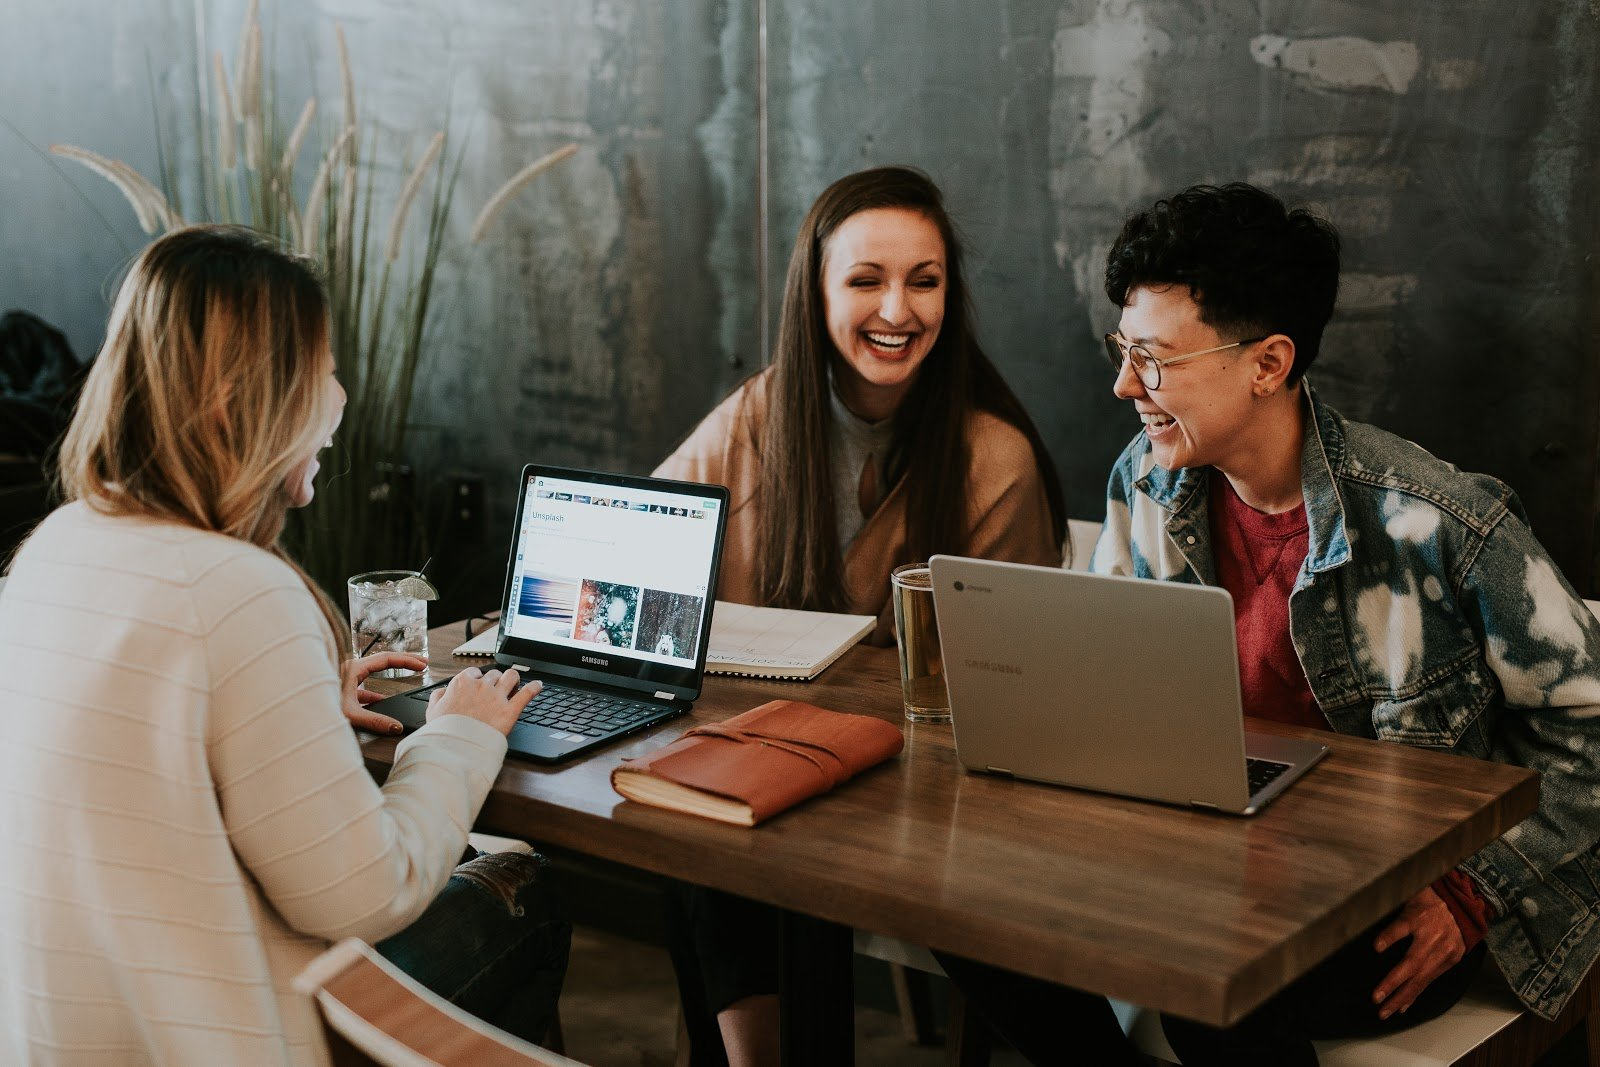 three women working on laptops laughing